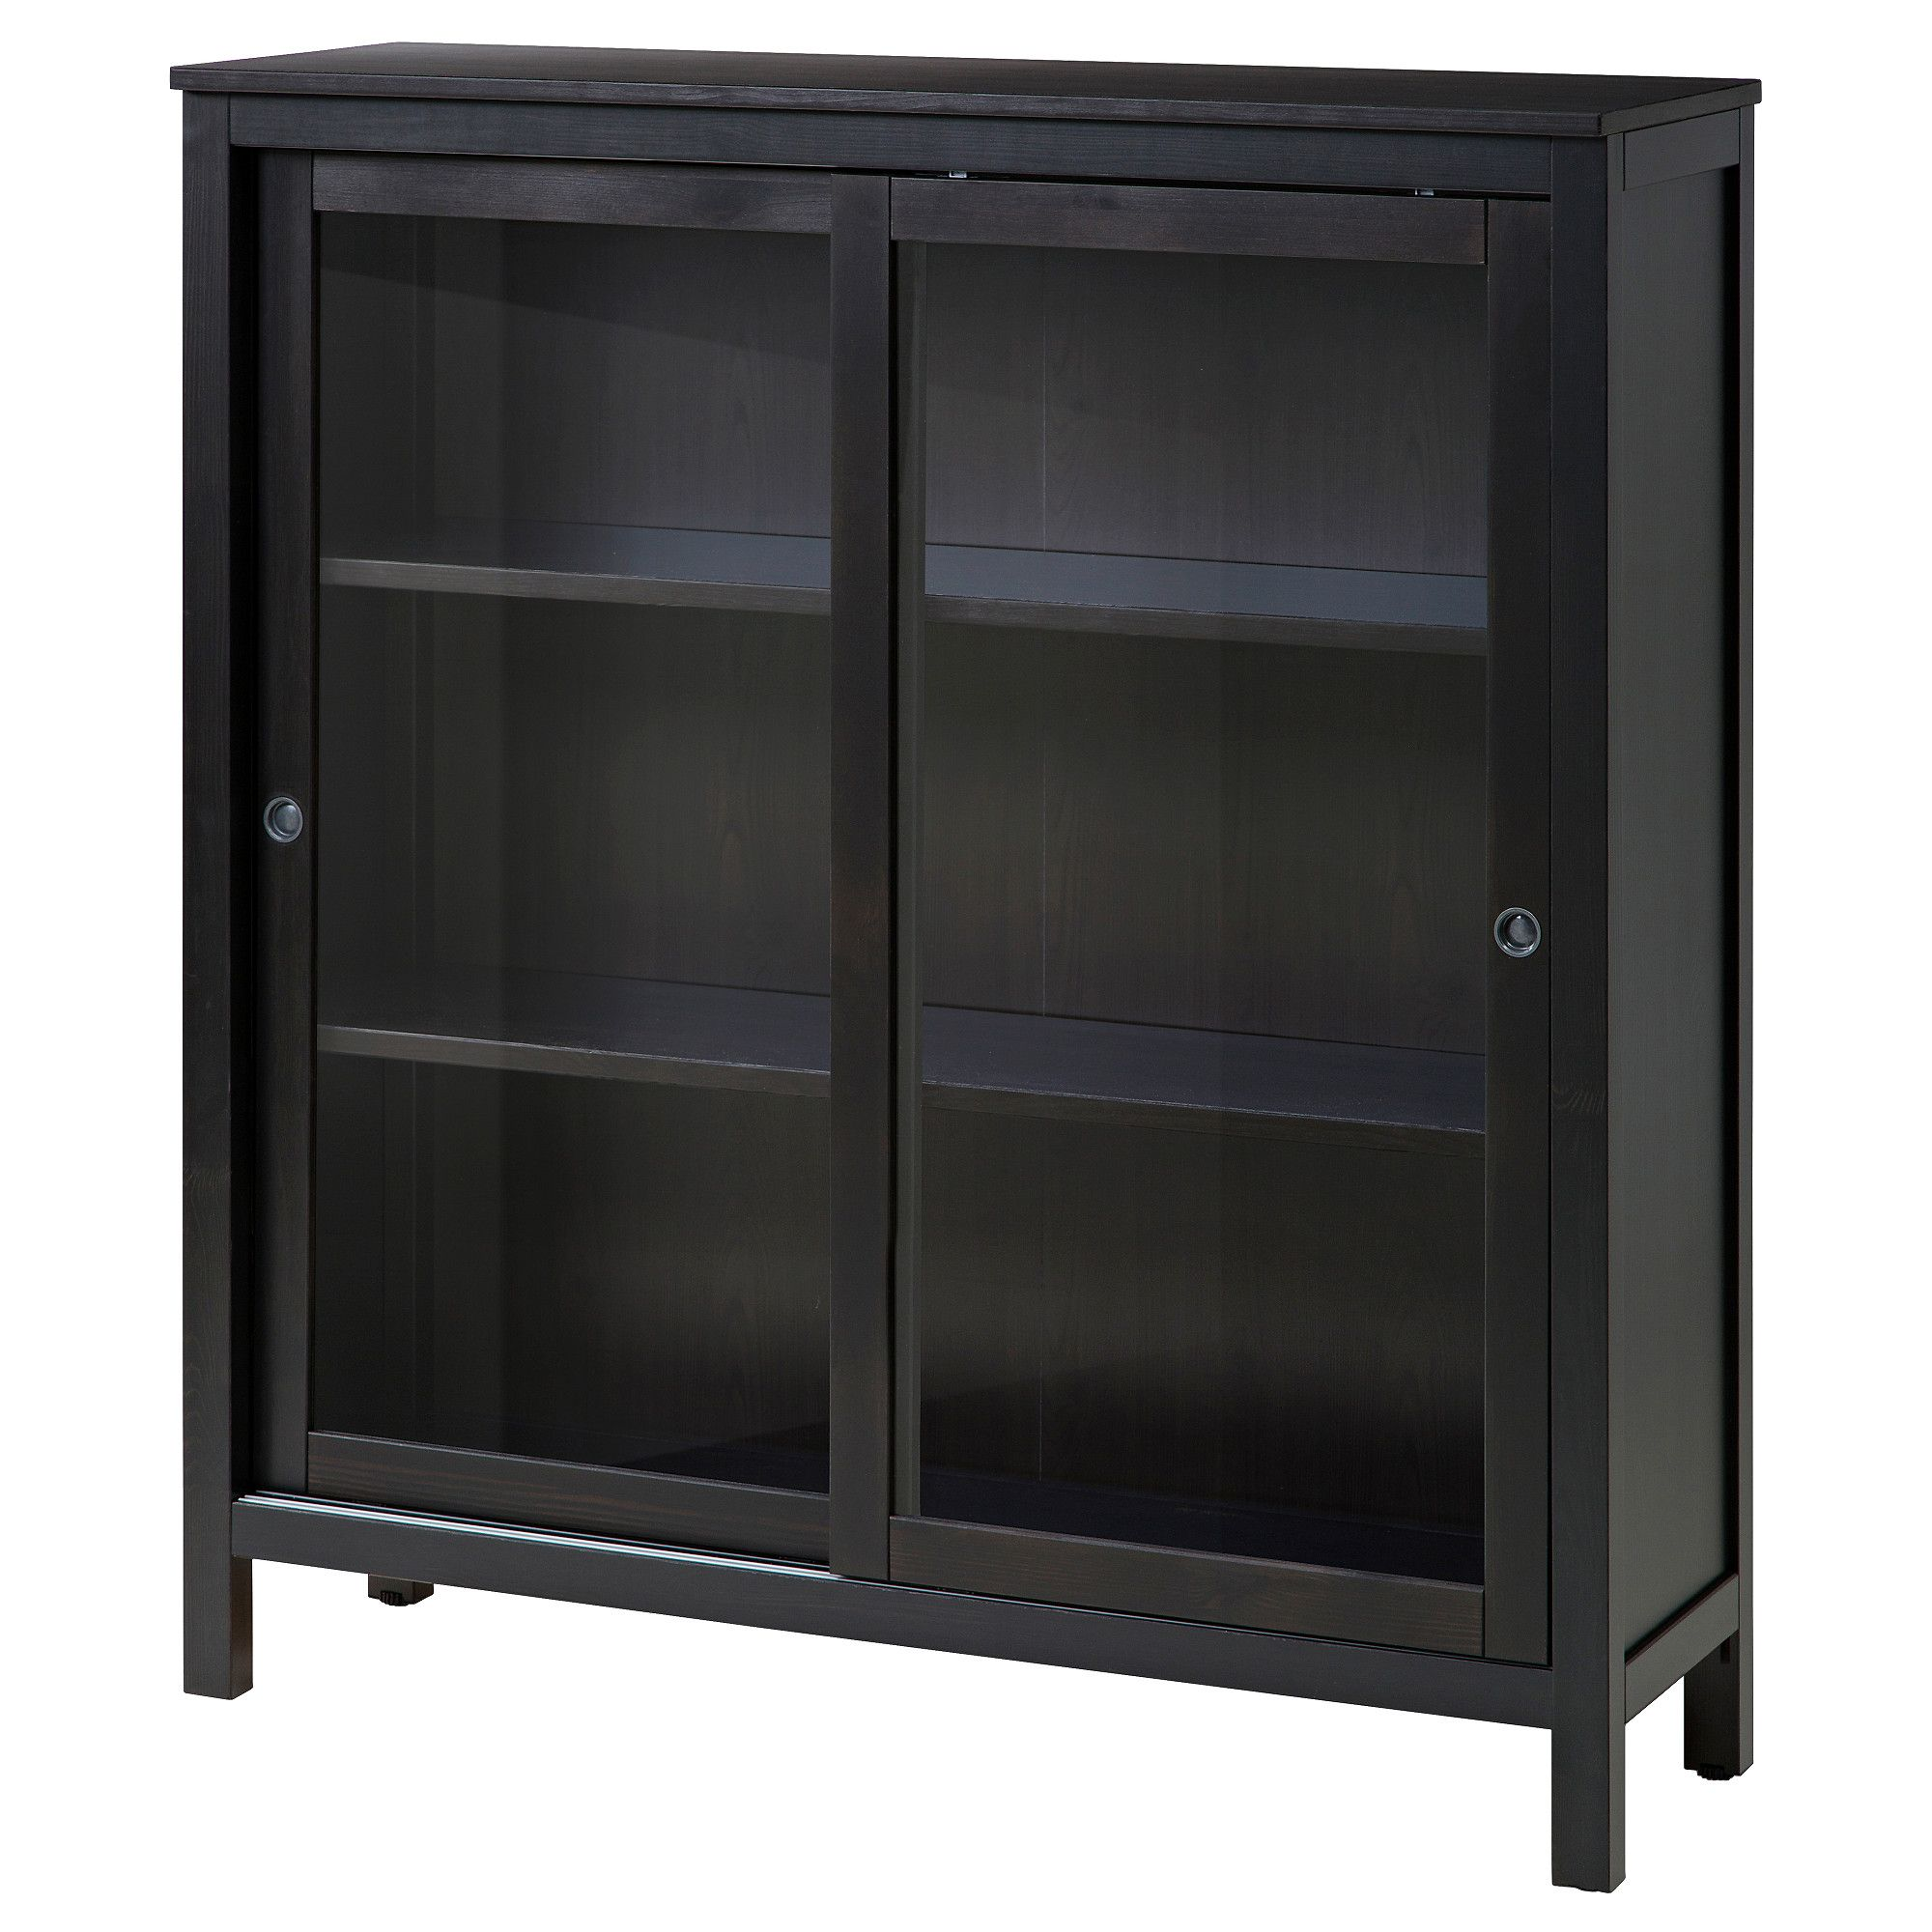 Furniture Home Furnishings Find Your Inspiration Glass Cabinet Doors Hemnes Ikea Hemnes